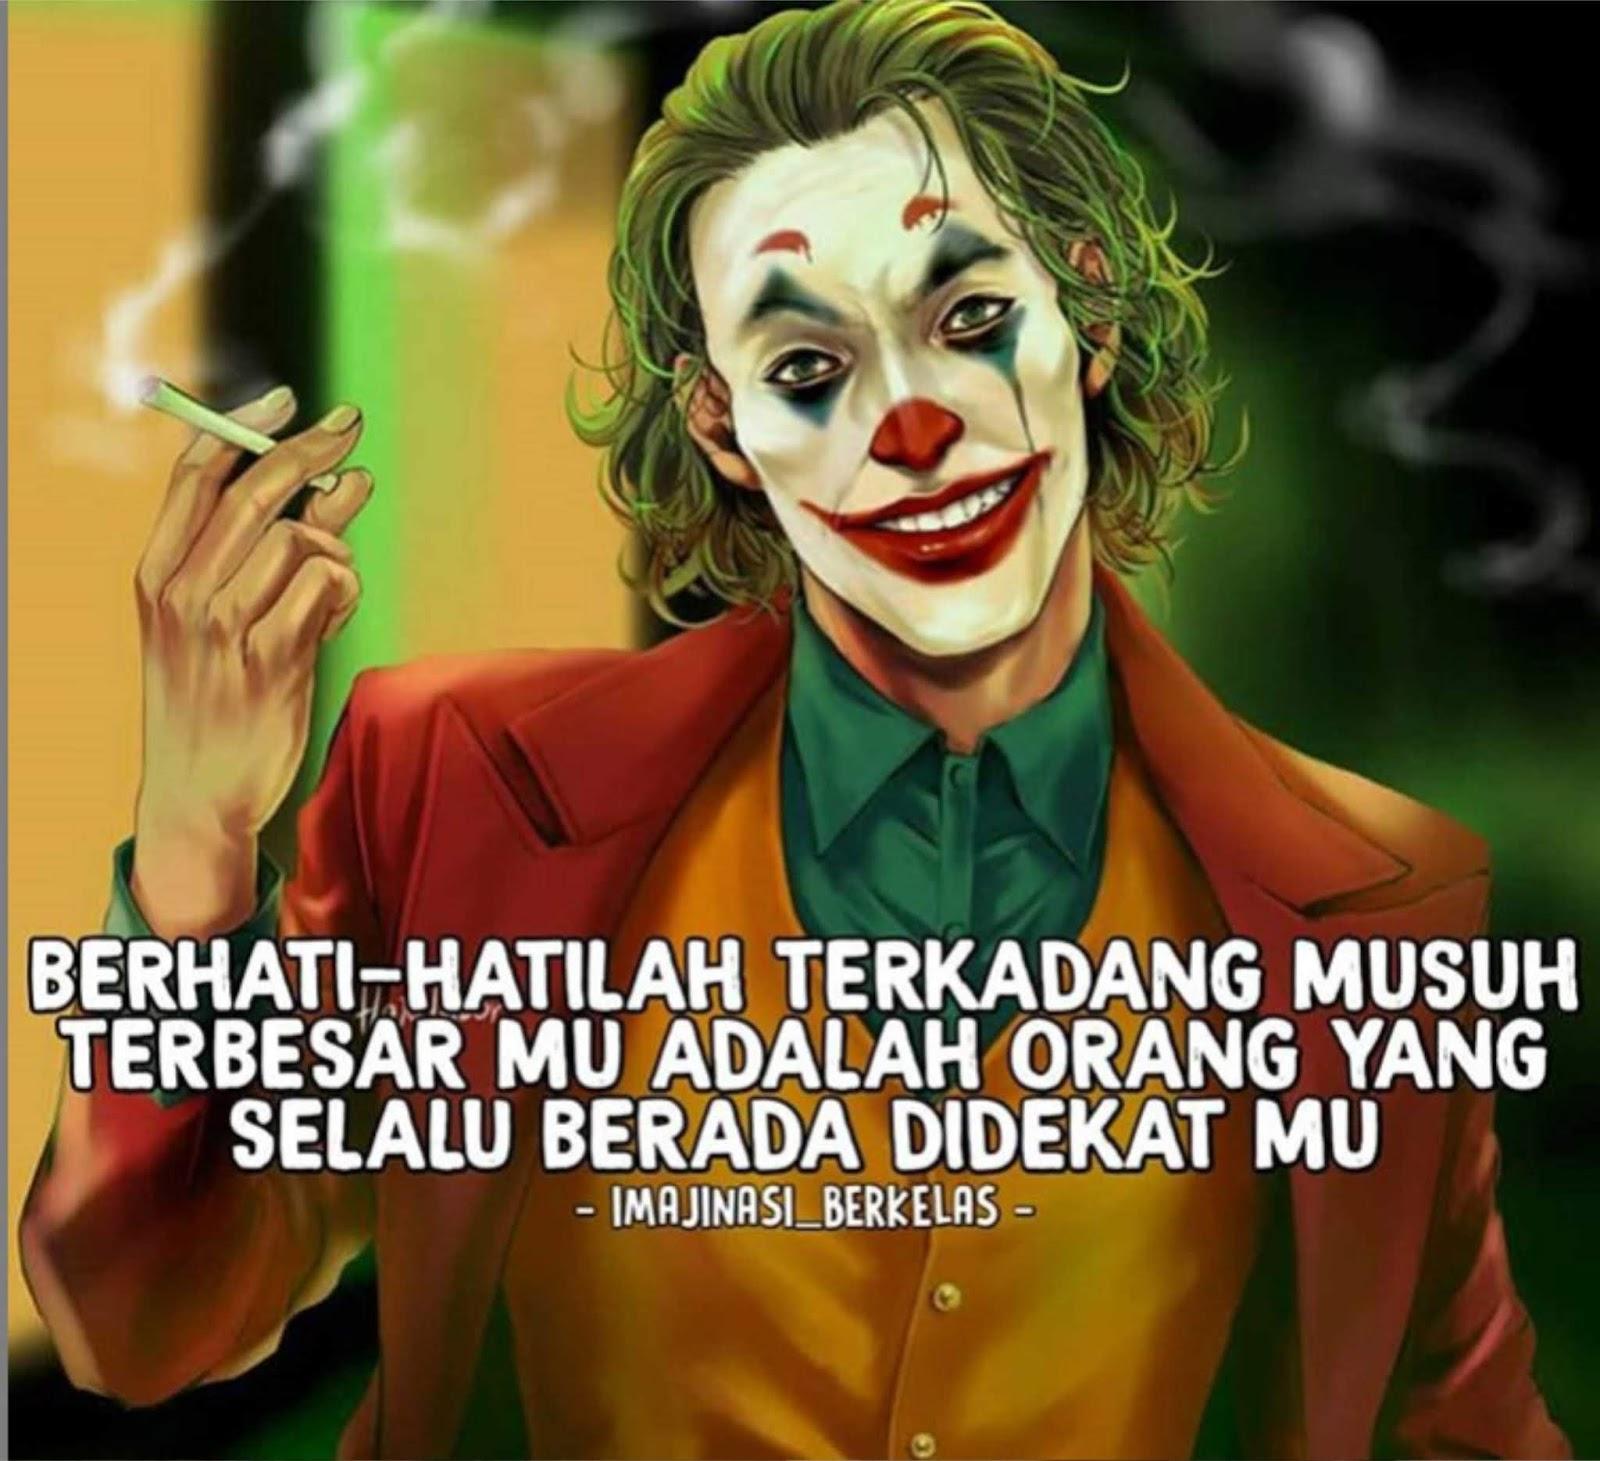 35 Gambar Meme Joker Dengan Kata2 Bijak Yang Keren Gambar